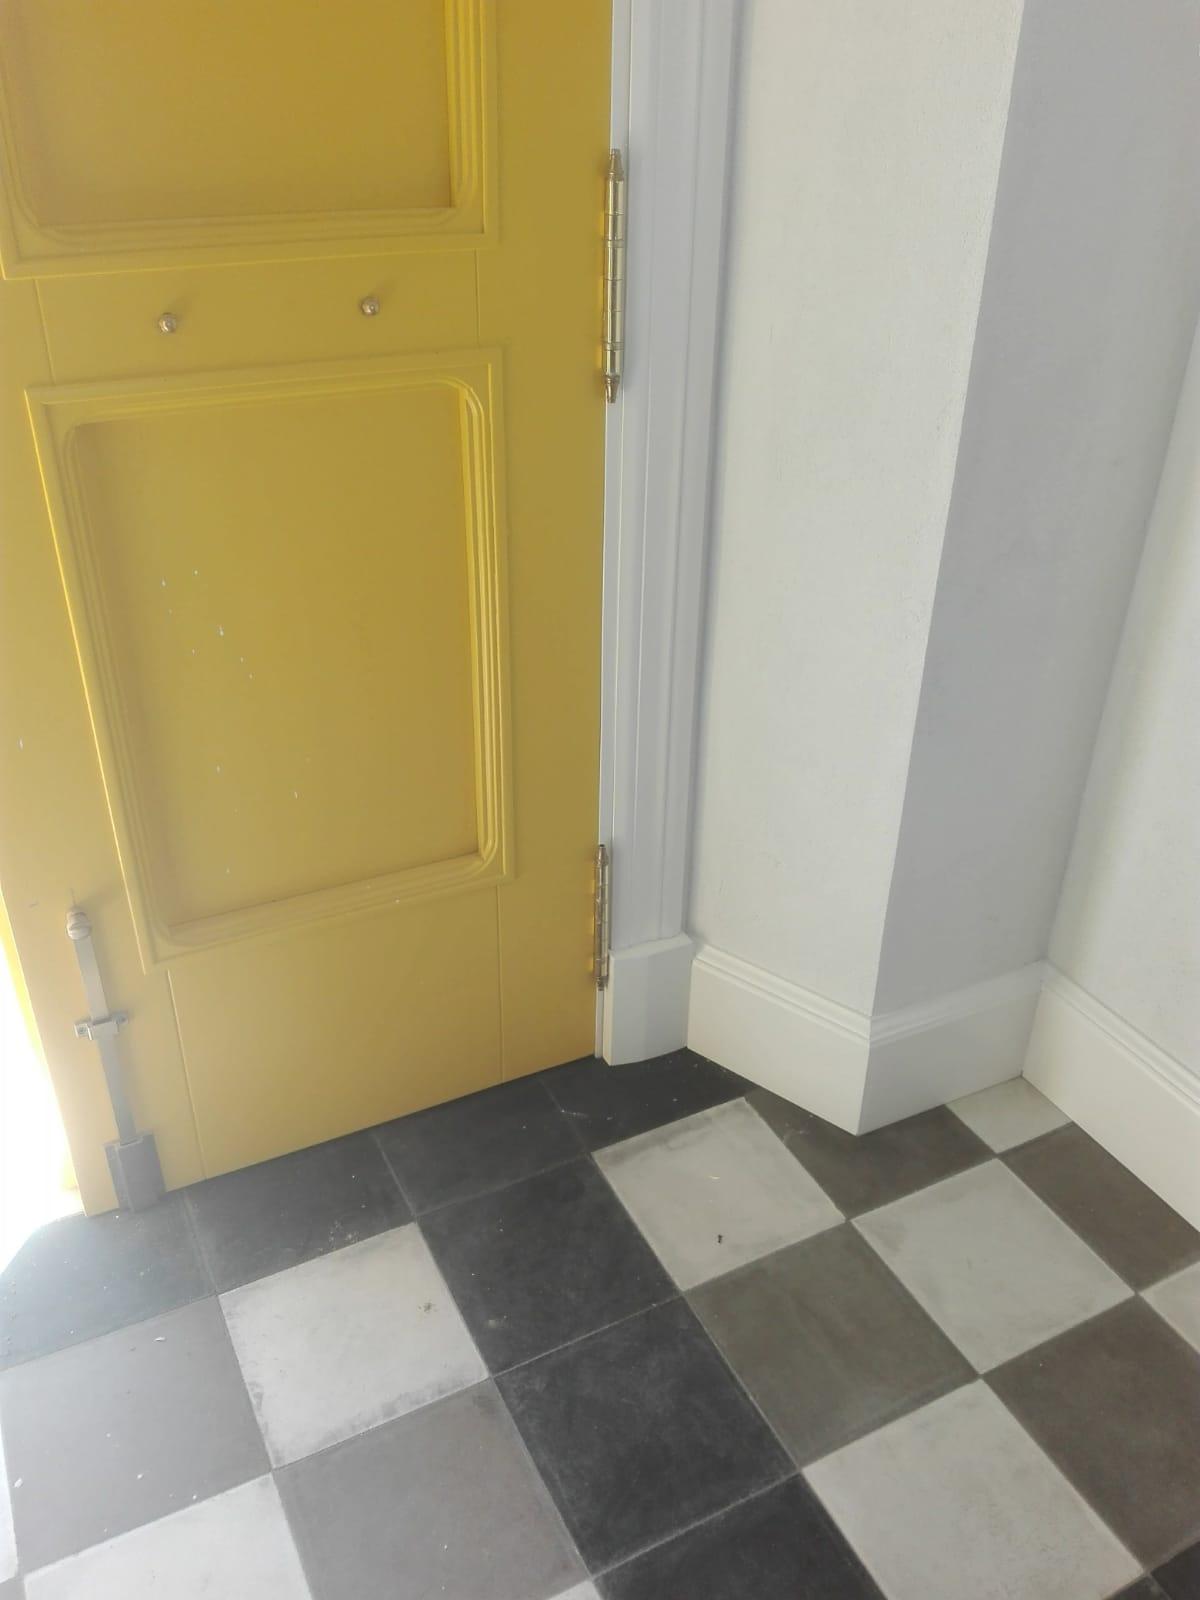 Puerta de calle amarilla